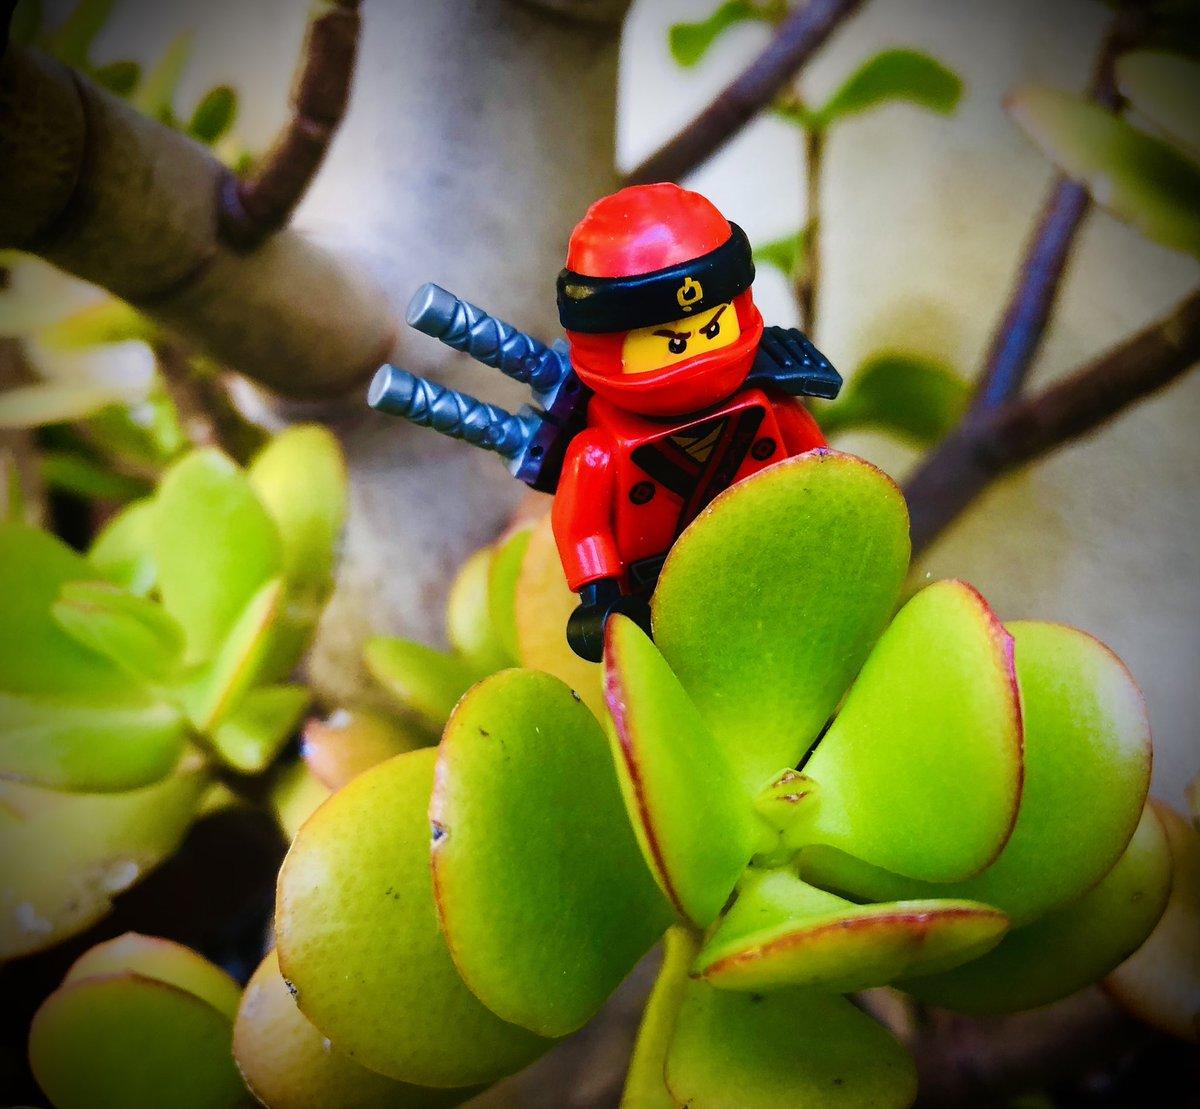 Spy game  #CloseUp #minifigure #Minifigure #LEGO #movie #movies #moviesanywhere #Ninjago #toys #toyphotography #toycollector #toy #Photoshoot #Photos #PhotoOfTheDay #PhotoMode #photographylovers #PhotographyIsLife #PhotographyIsArt #Photography #Photogrammetry #photobook